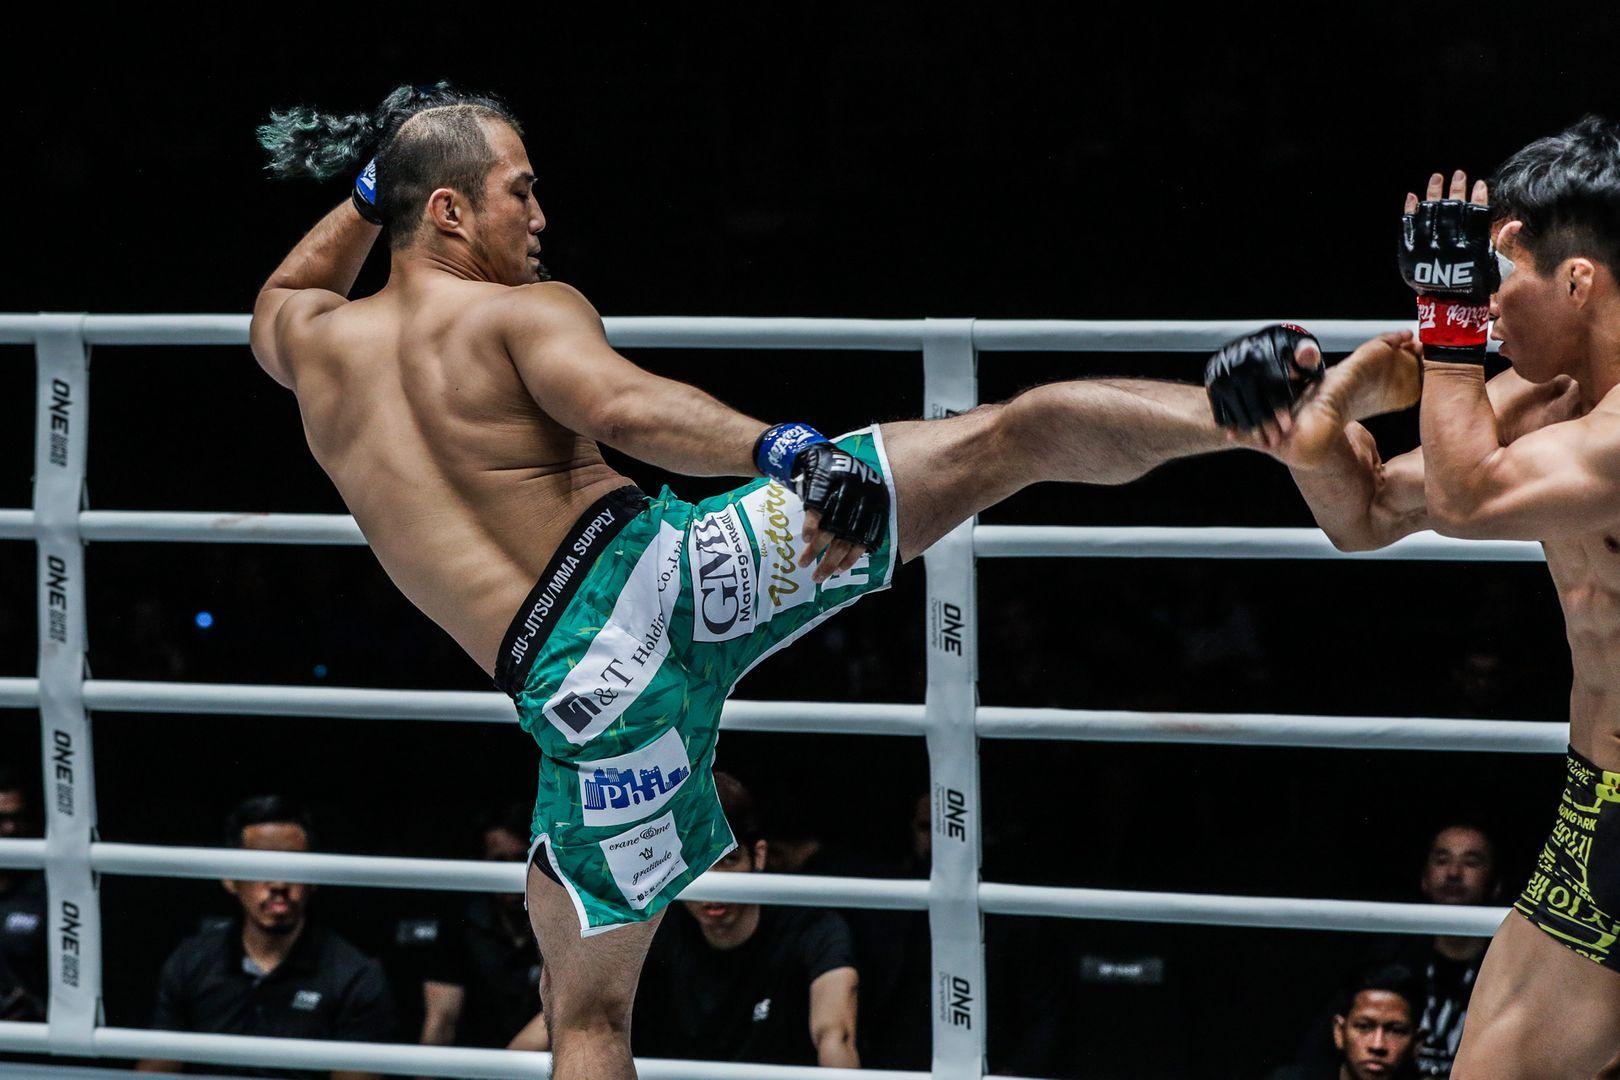 Japanese lightweight Kimihiro Eto throws a roundhouse kick